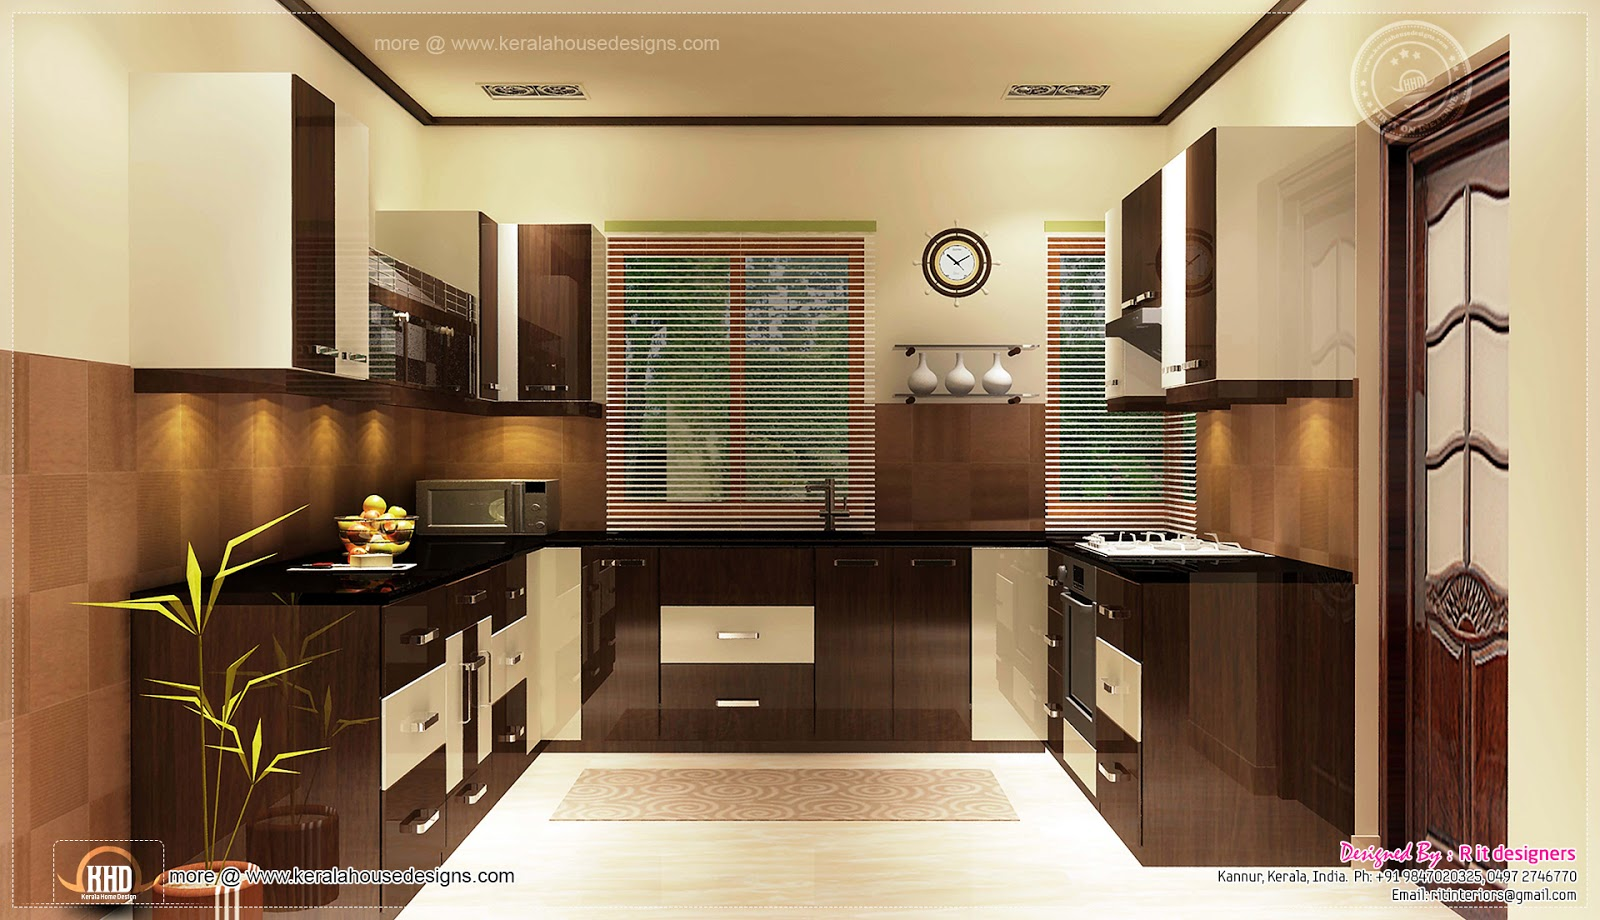 Home interior designs by Rit designers - Kerala home ...